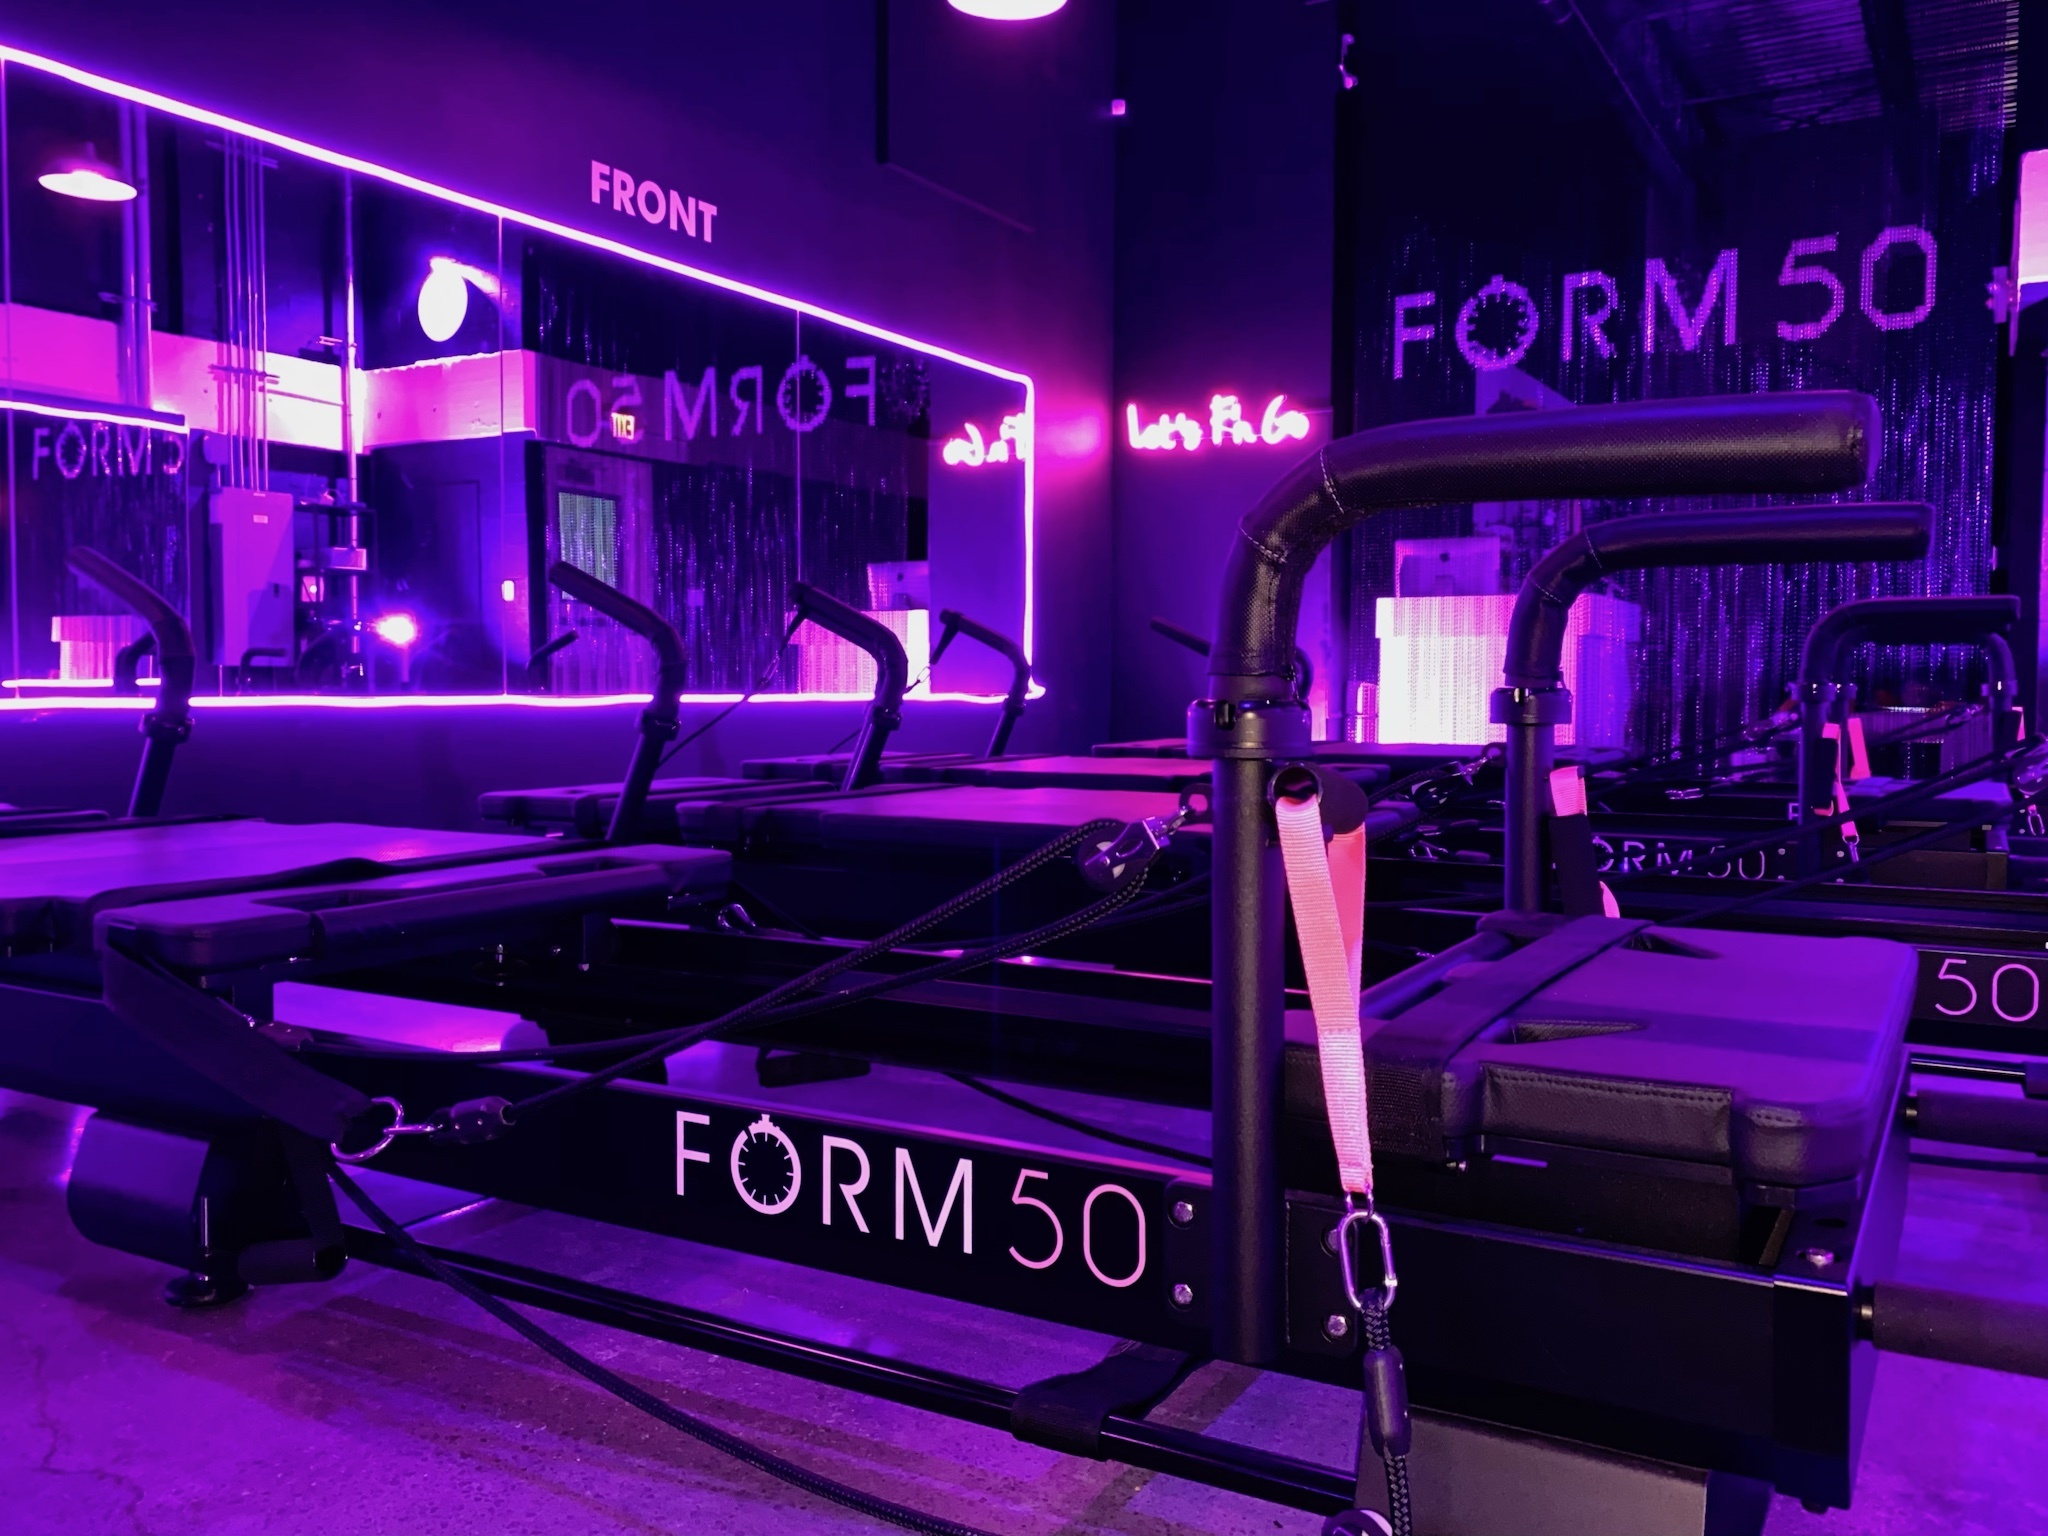 Form 50 Fitness Miami